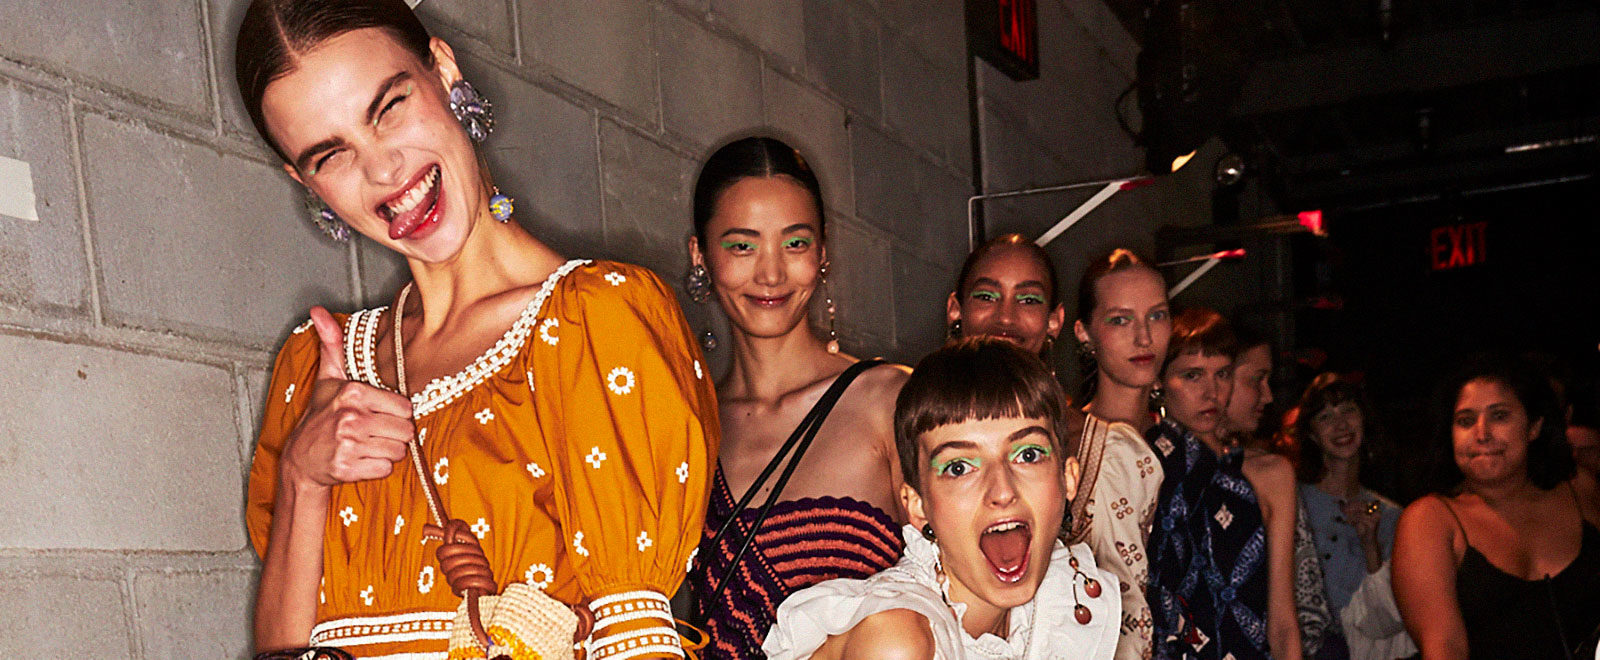 Sonny Vandevelde NYFW SS20 New York Fashion Week